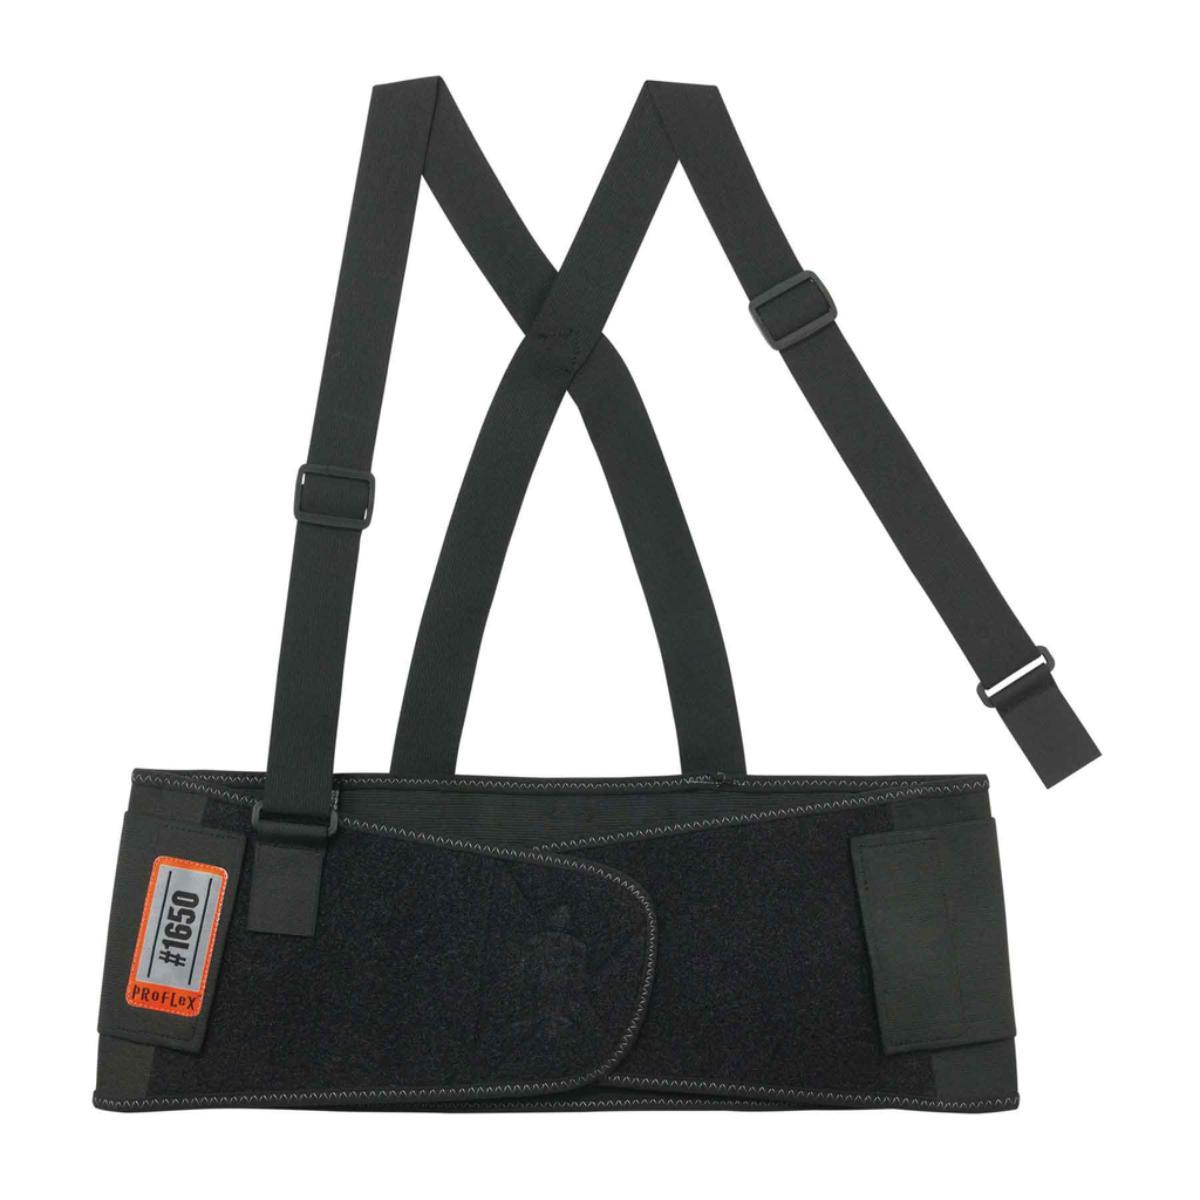 1650 2XL Black Economy Elastic Back Support